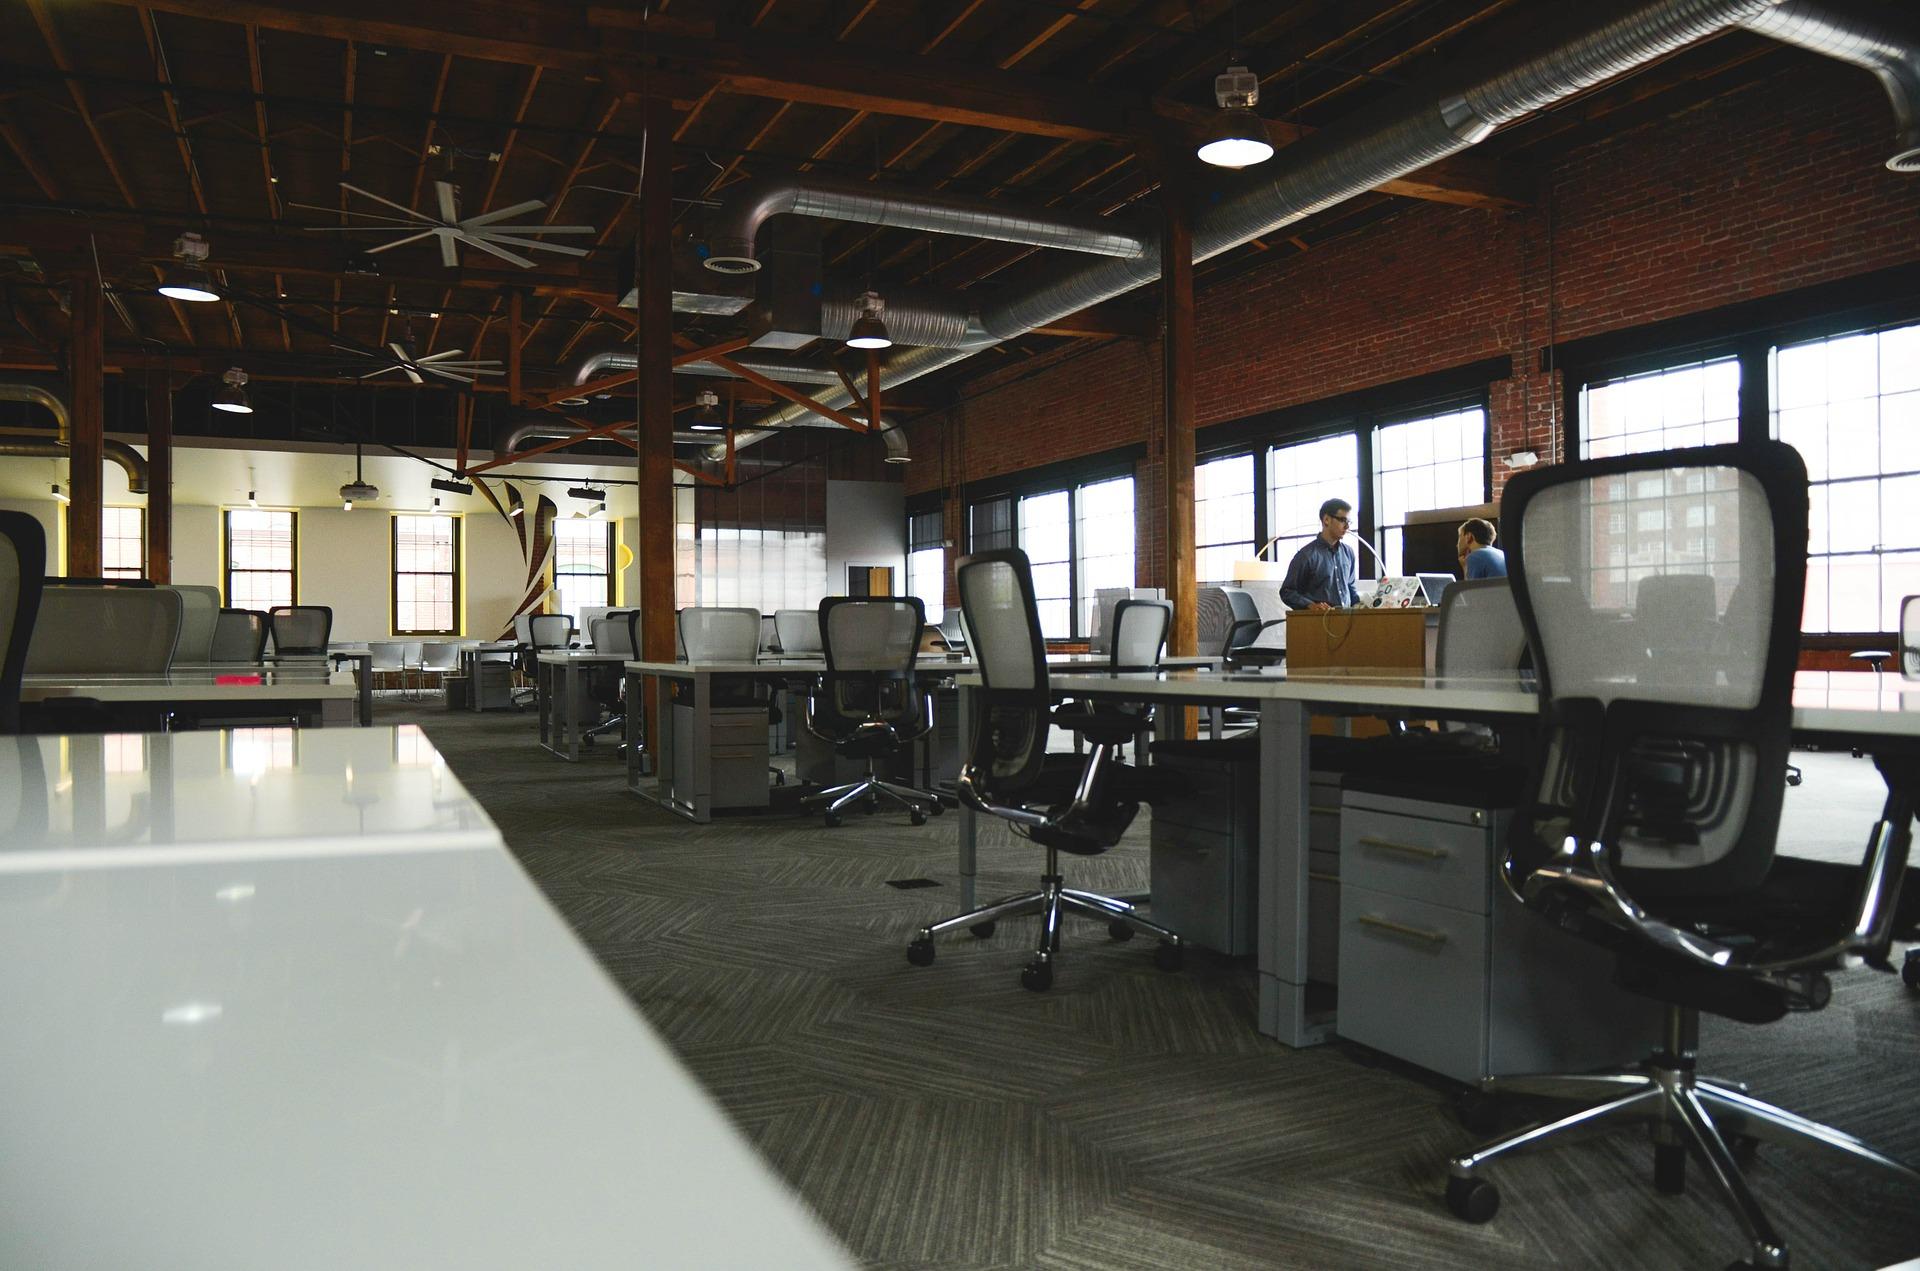 Ergonomic Chairs and Desks